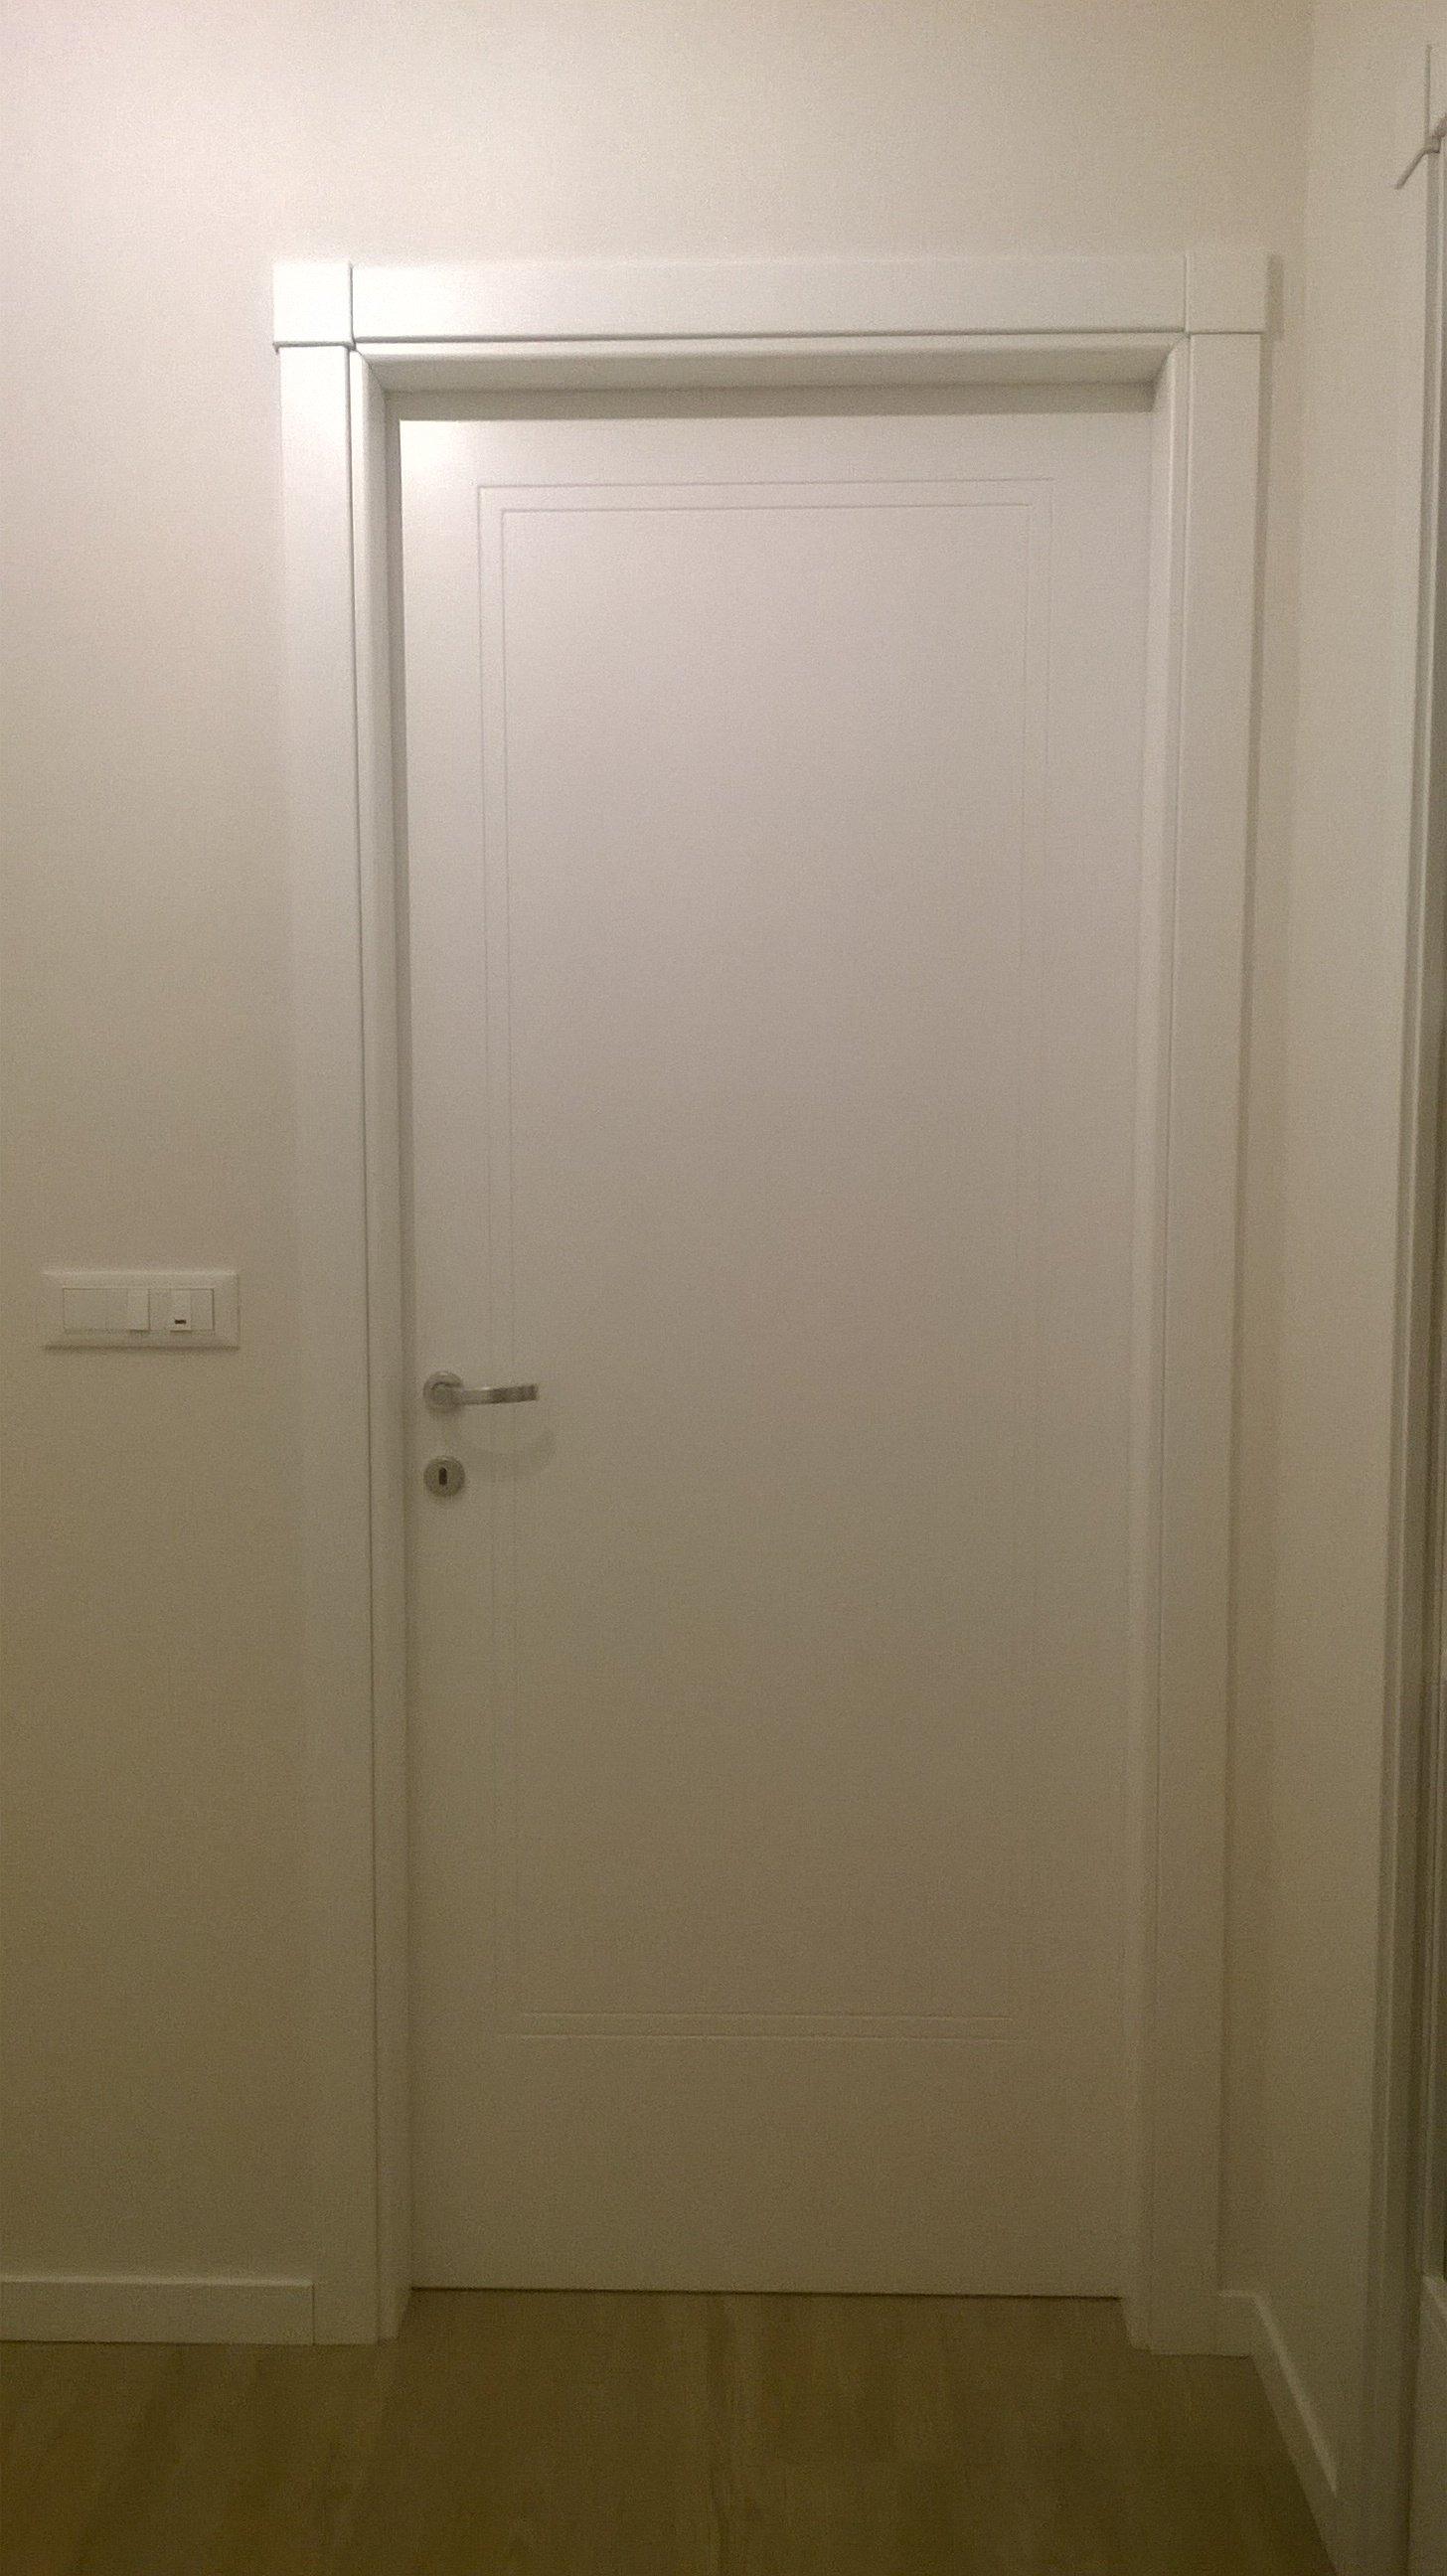 Porta interna semplice bianca